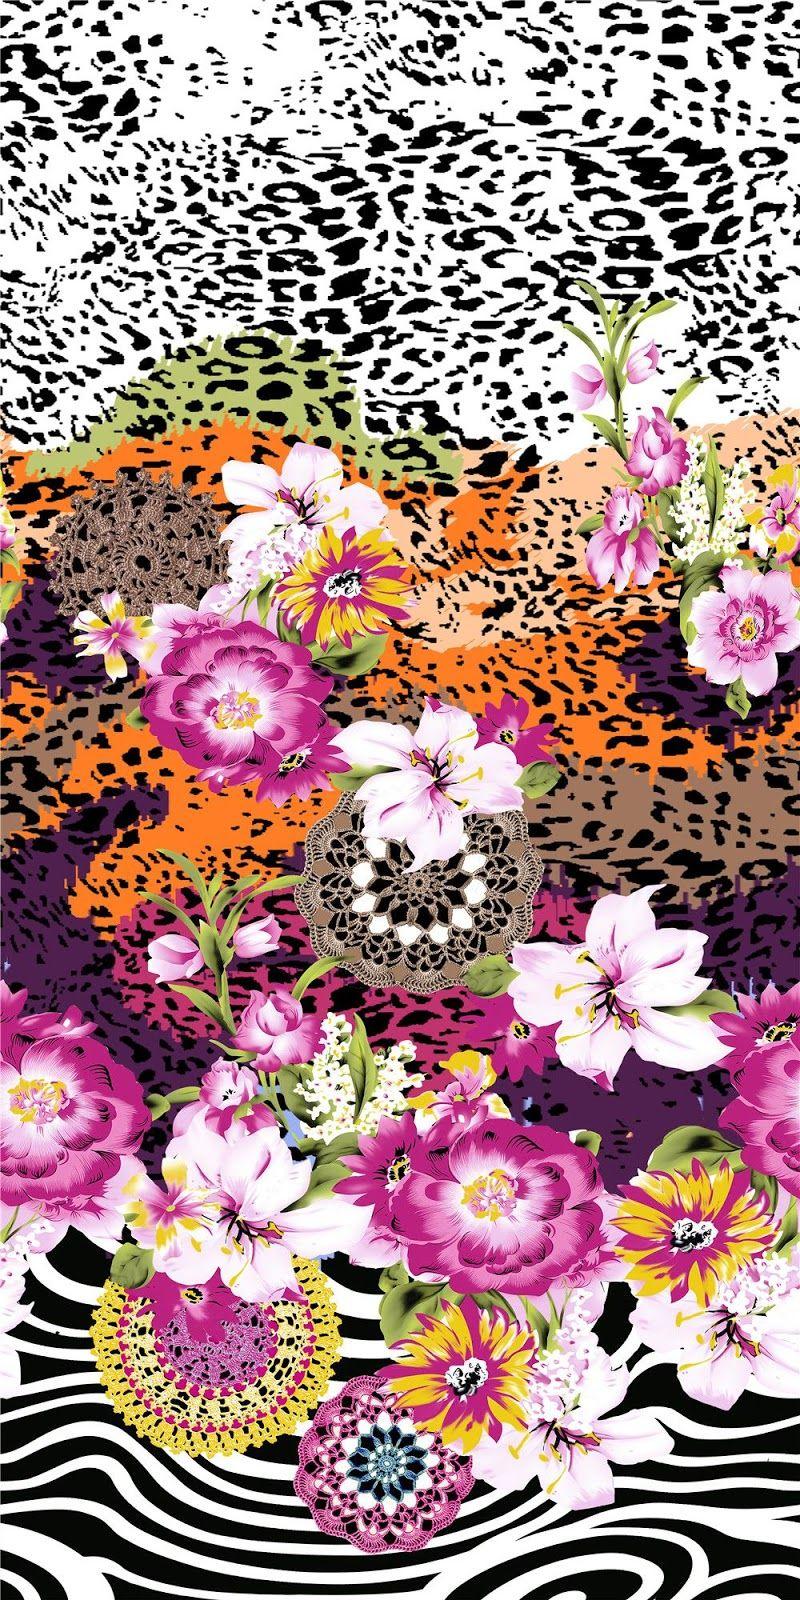 HAND DRAWN_Flower Design_Digital Print_1 Blisse Design